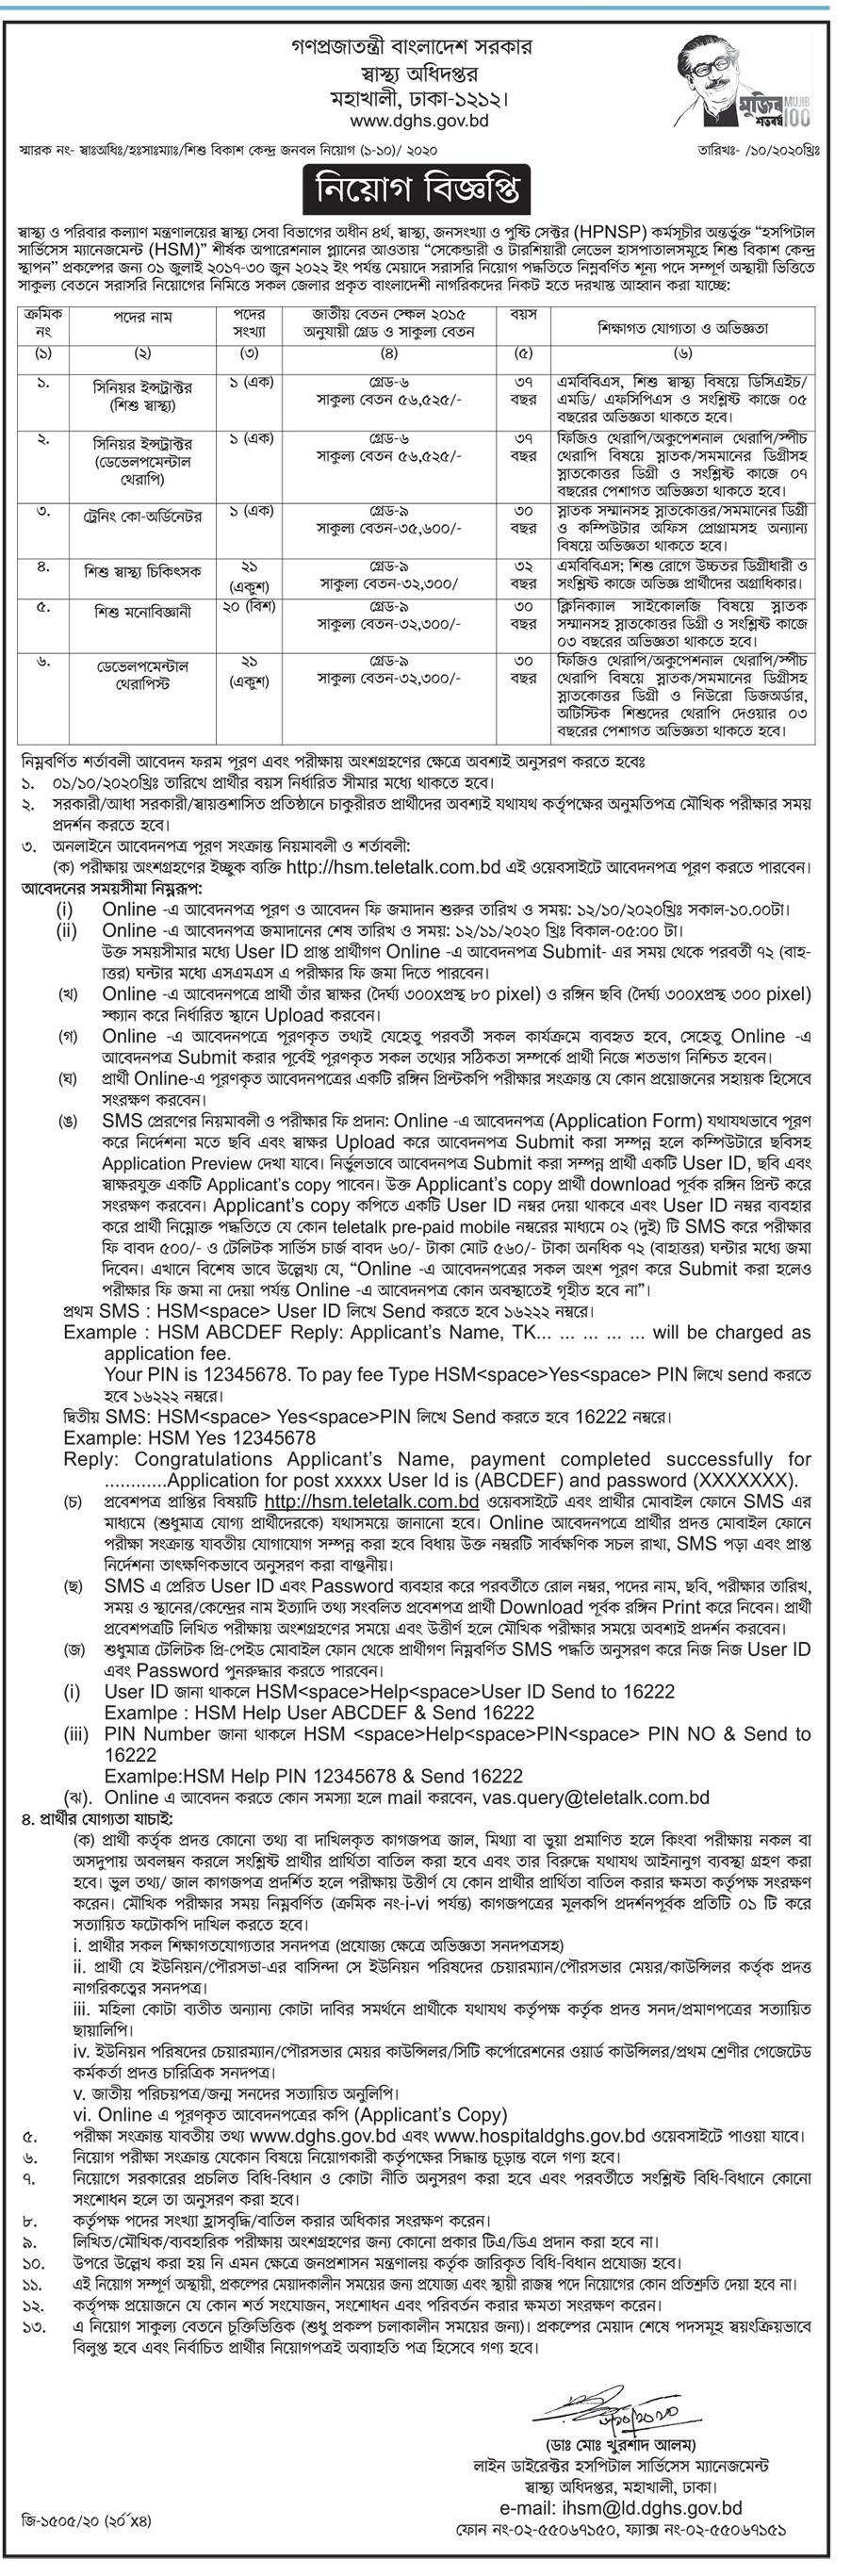 Directorate General Of Health Services Job Circular 2020 www.dghs.gov.bd